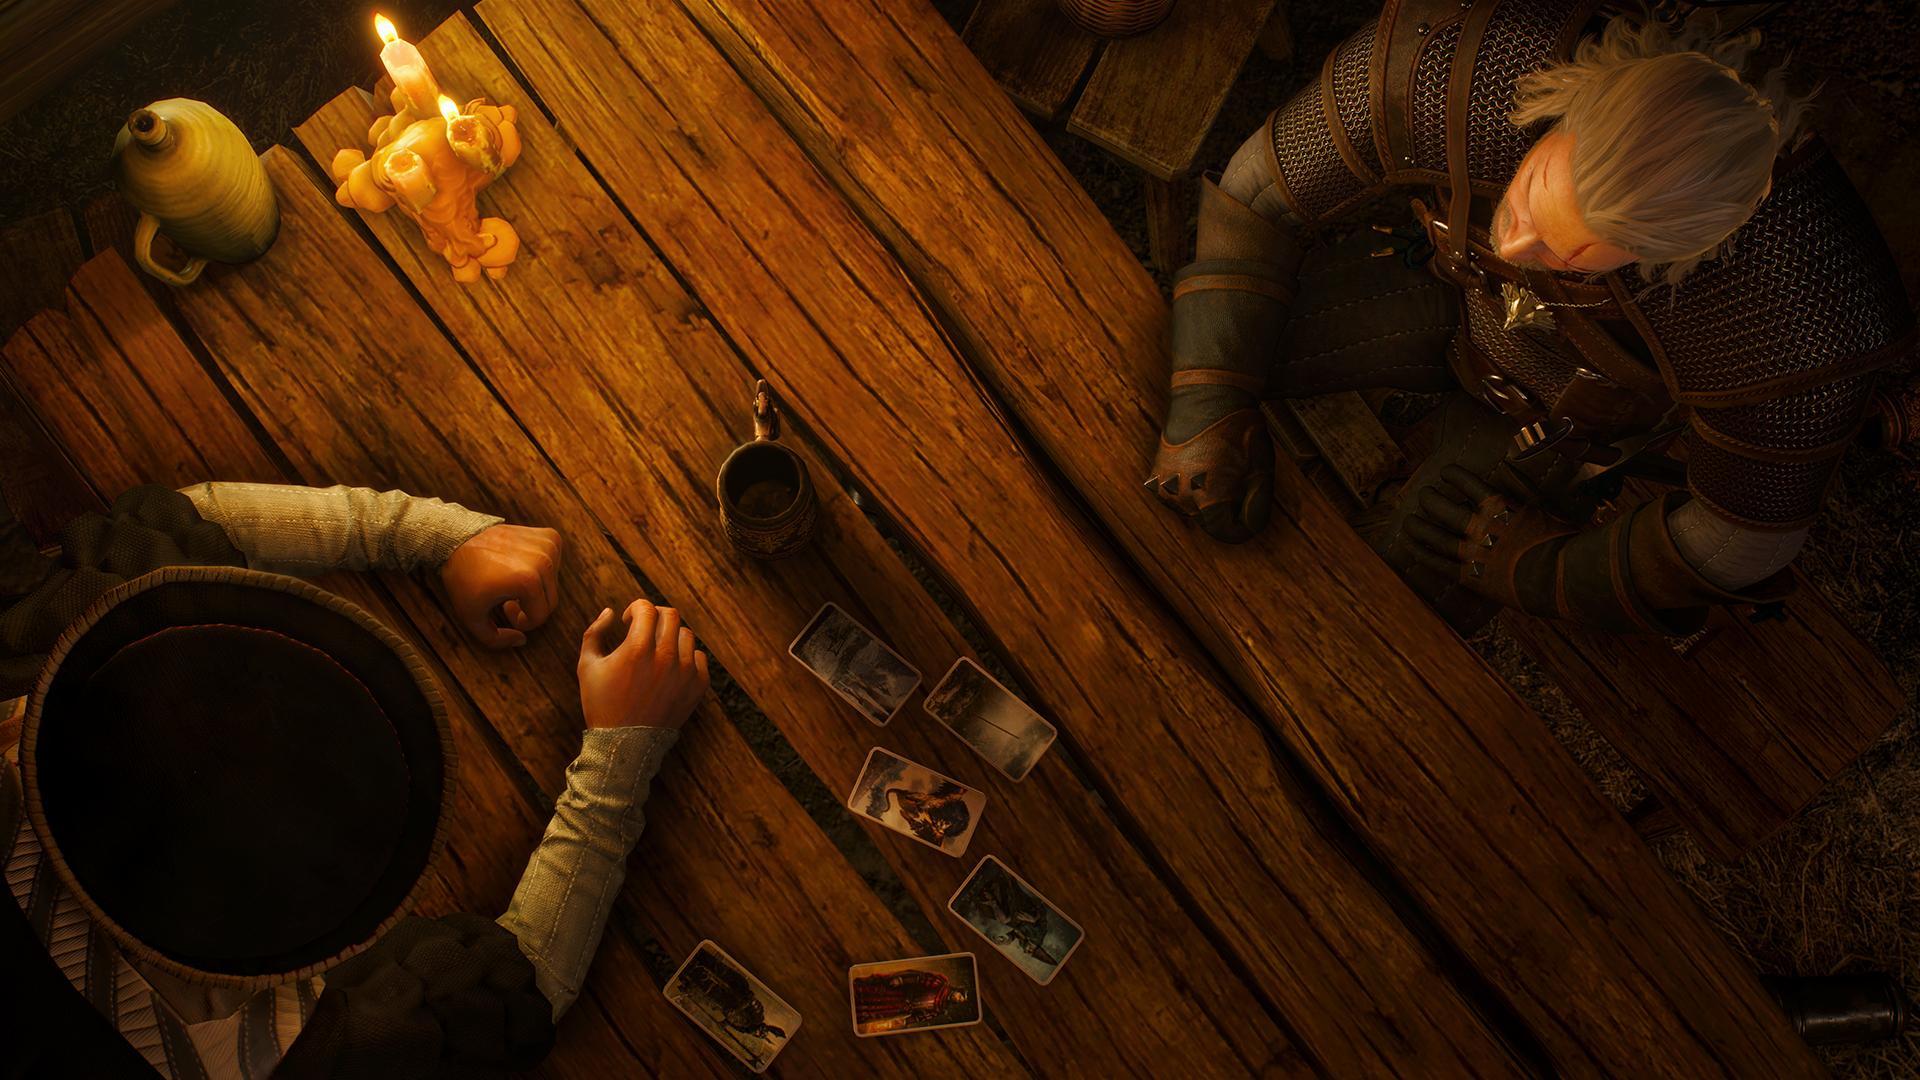 The Witcher 3: Wild Hunt. Новые скриншоты.    UPD#1  UPD#2  - Изображение 2